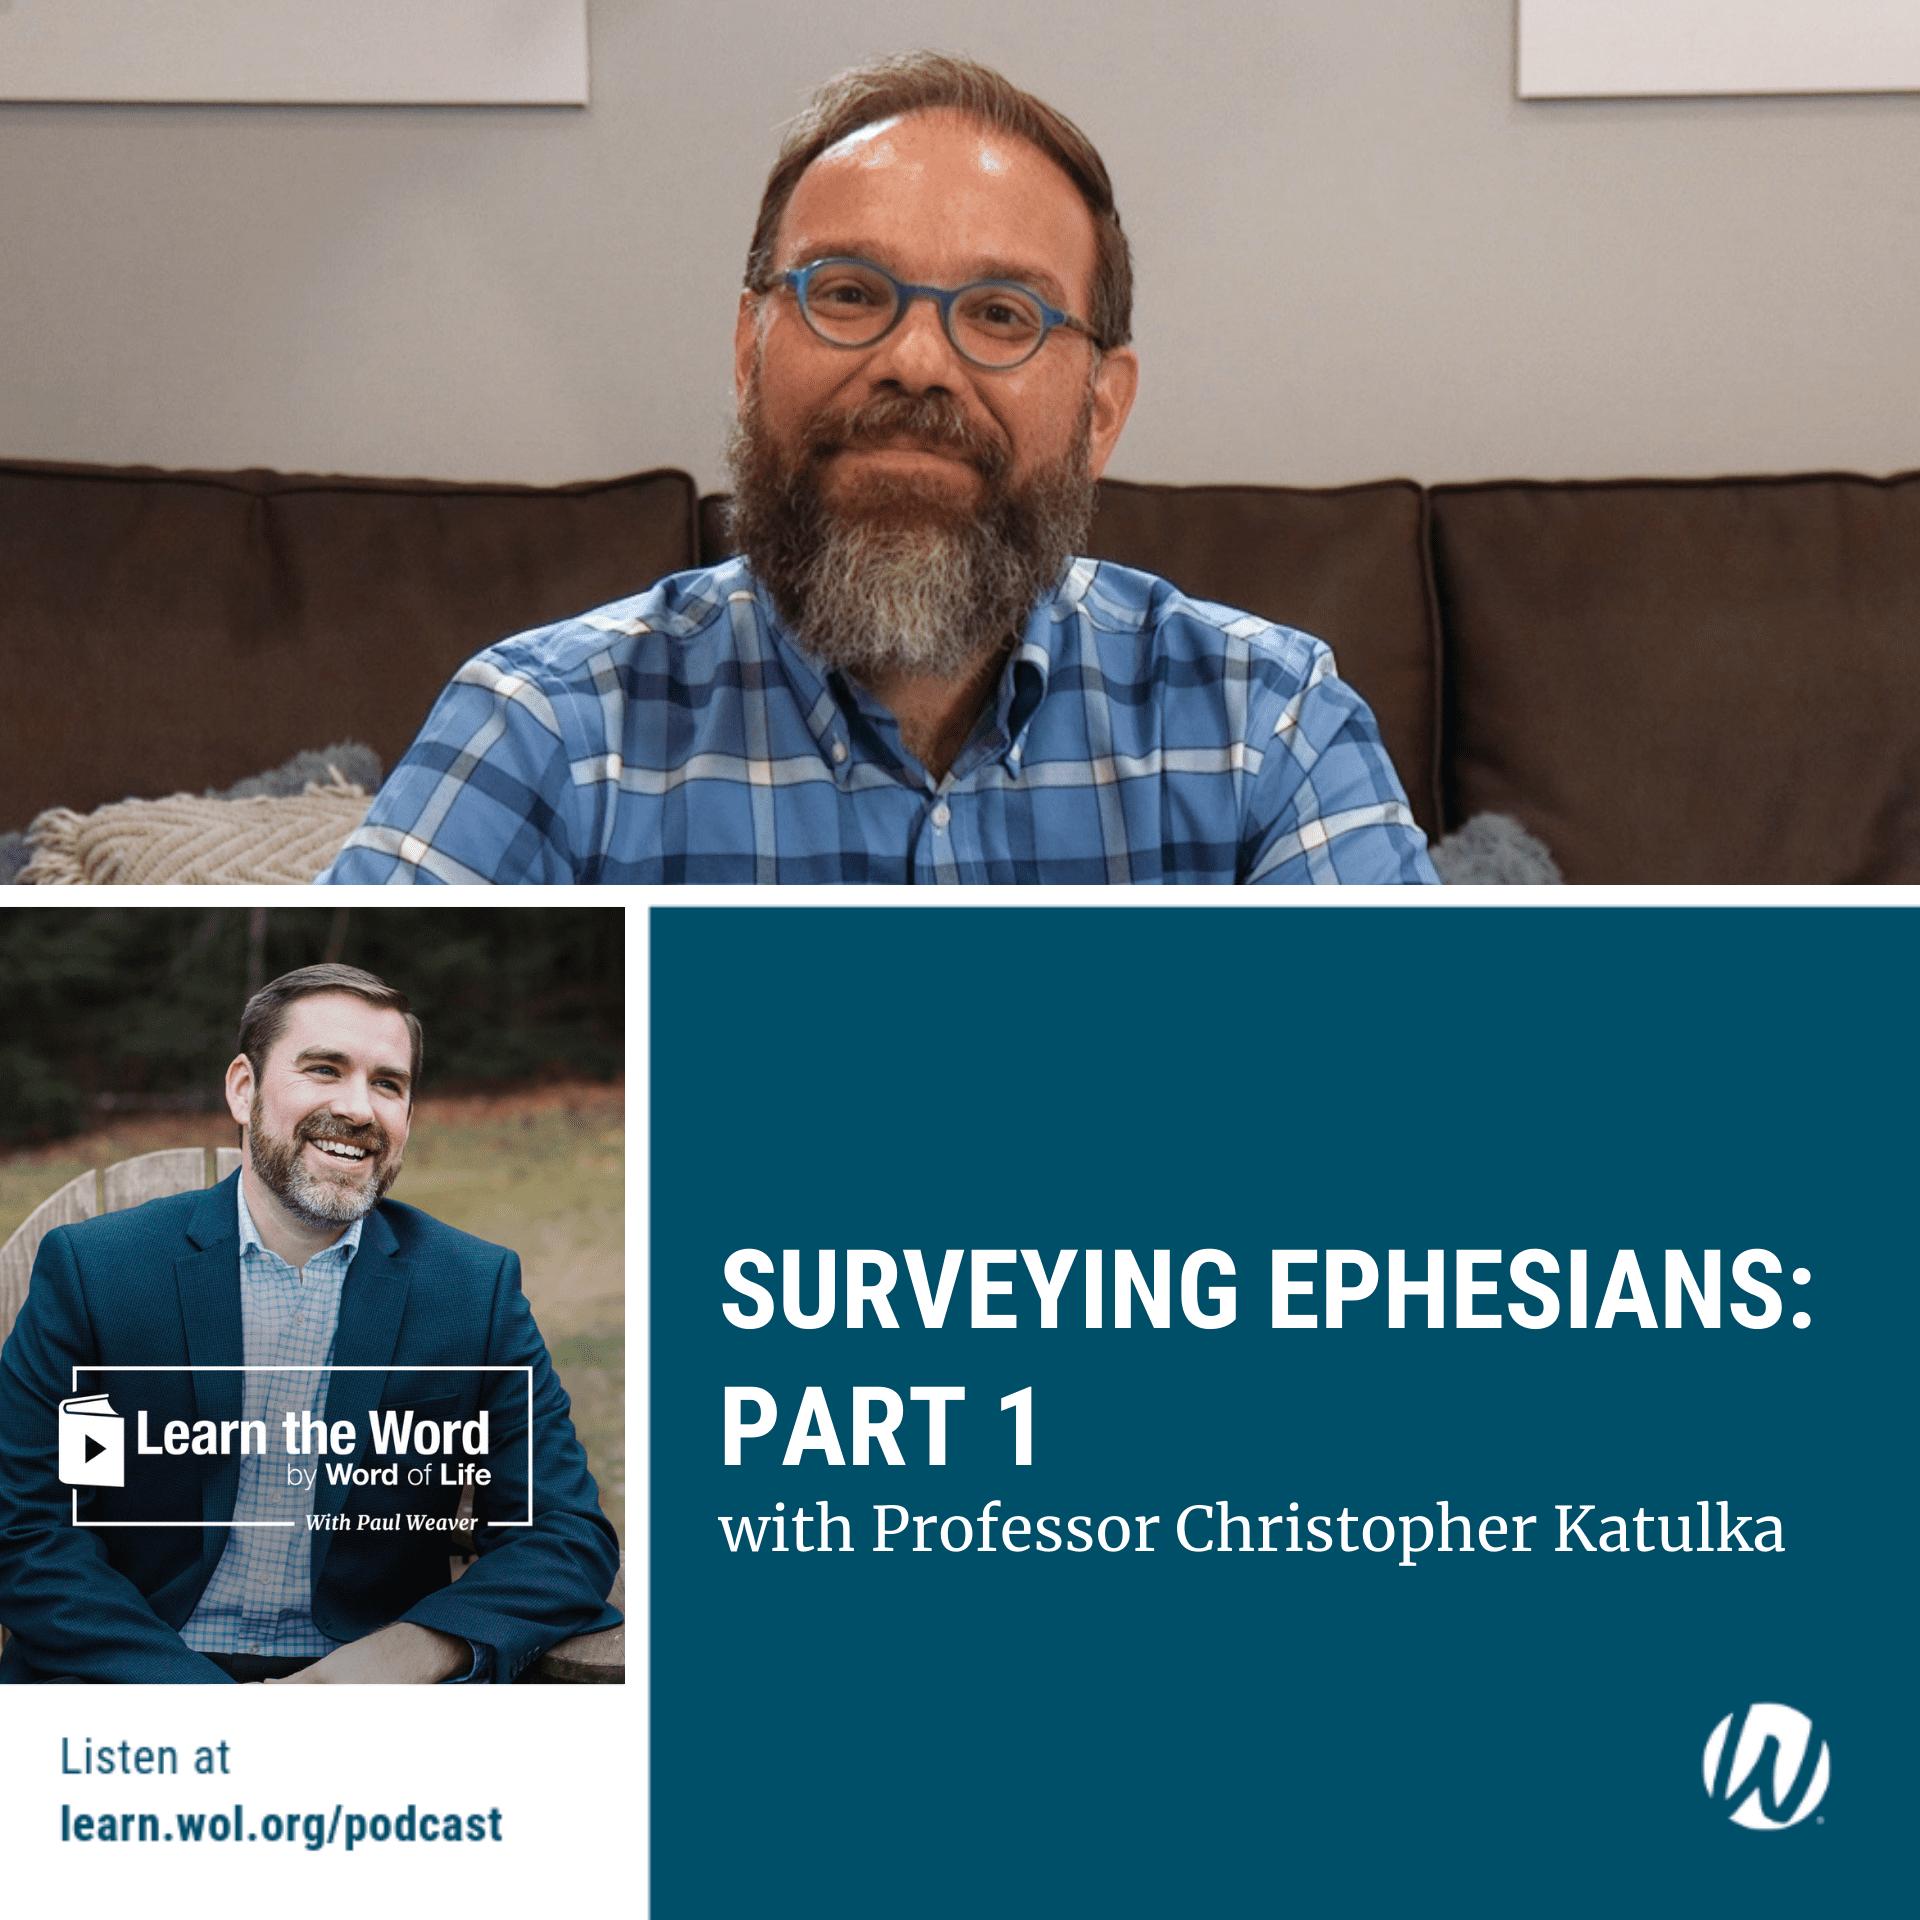 Surveying Ephesians Part 1 - with Professor Christopher Katulka (1)